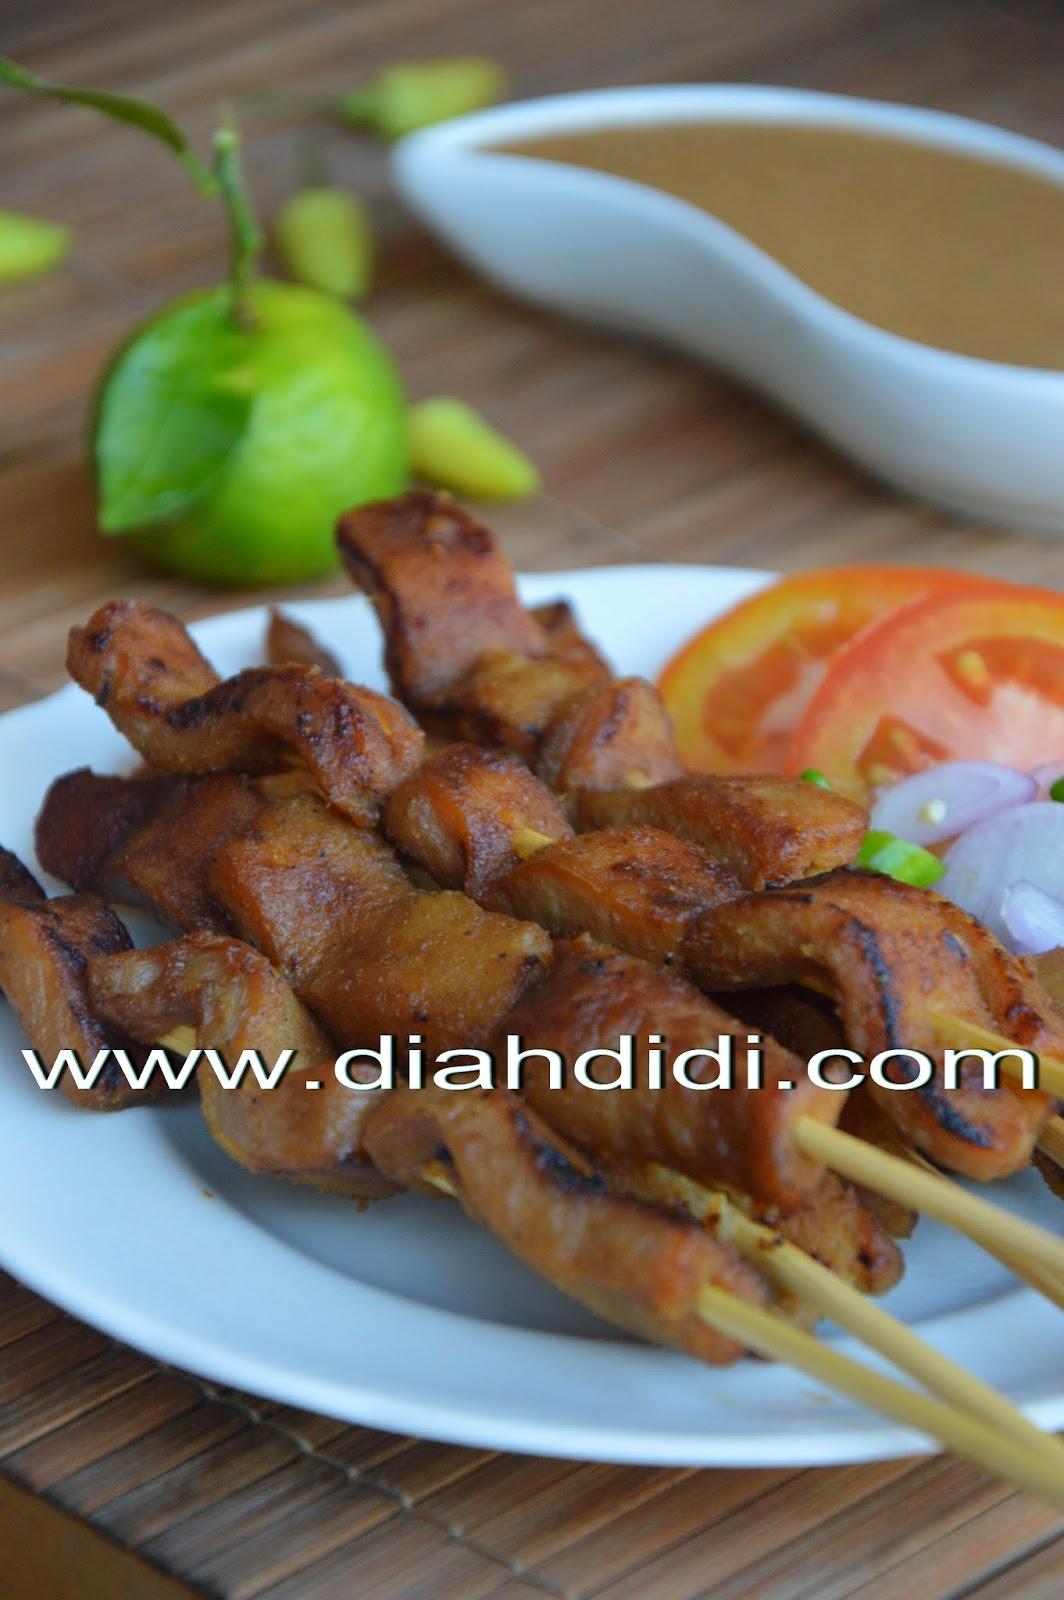 Diah Didis Kitchen Sate Kere